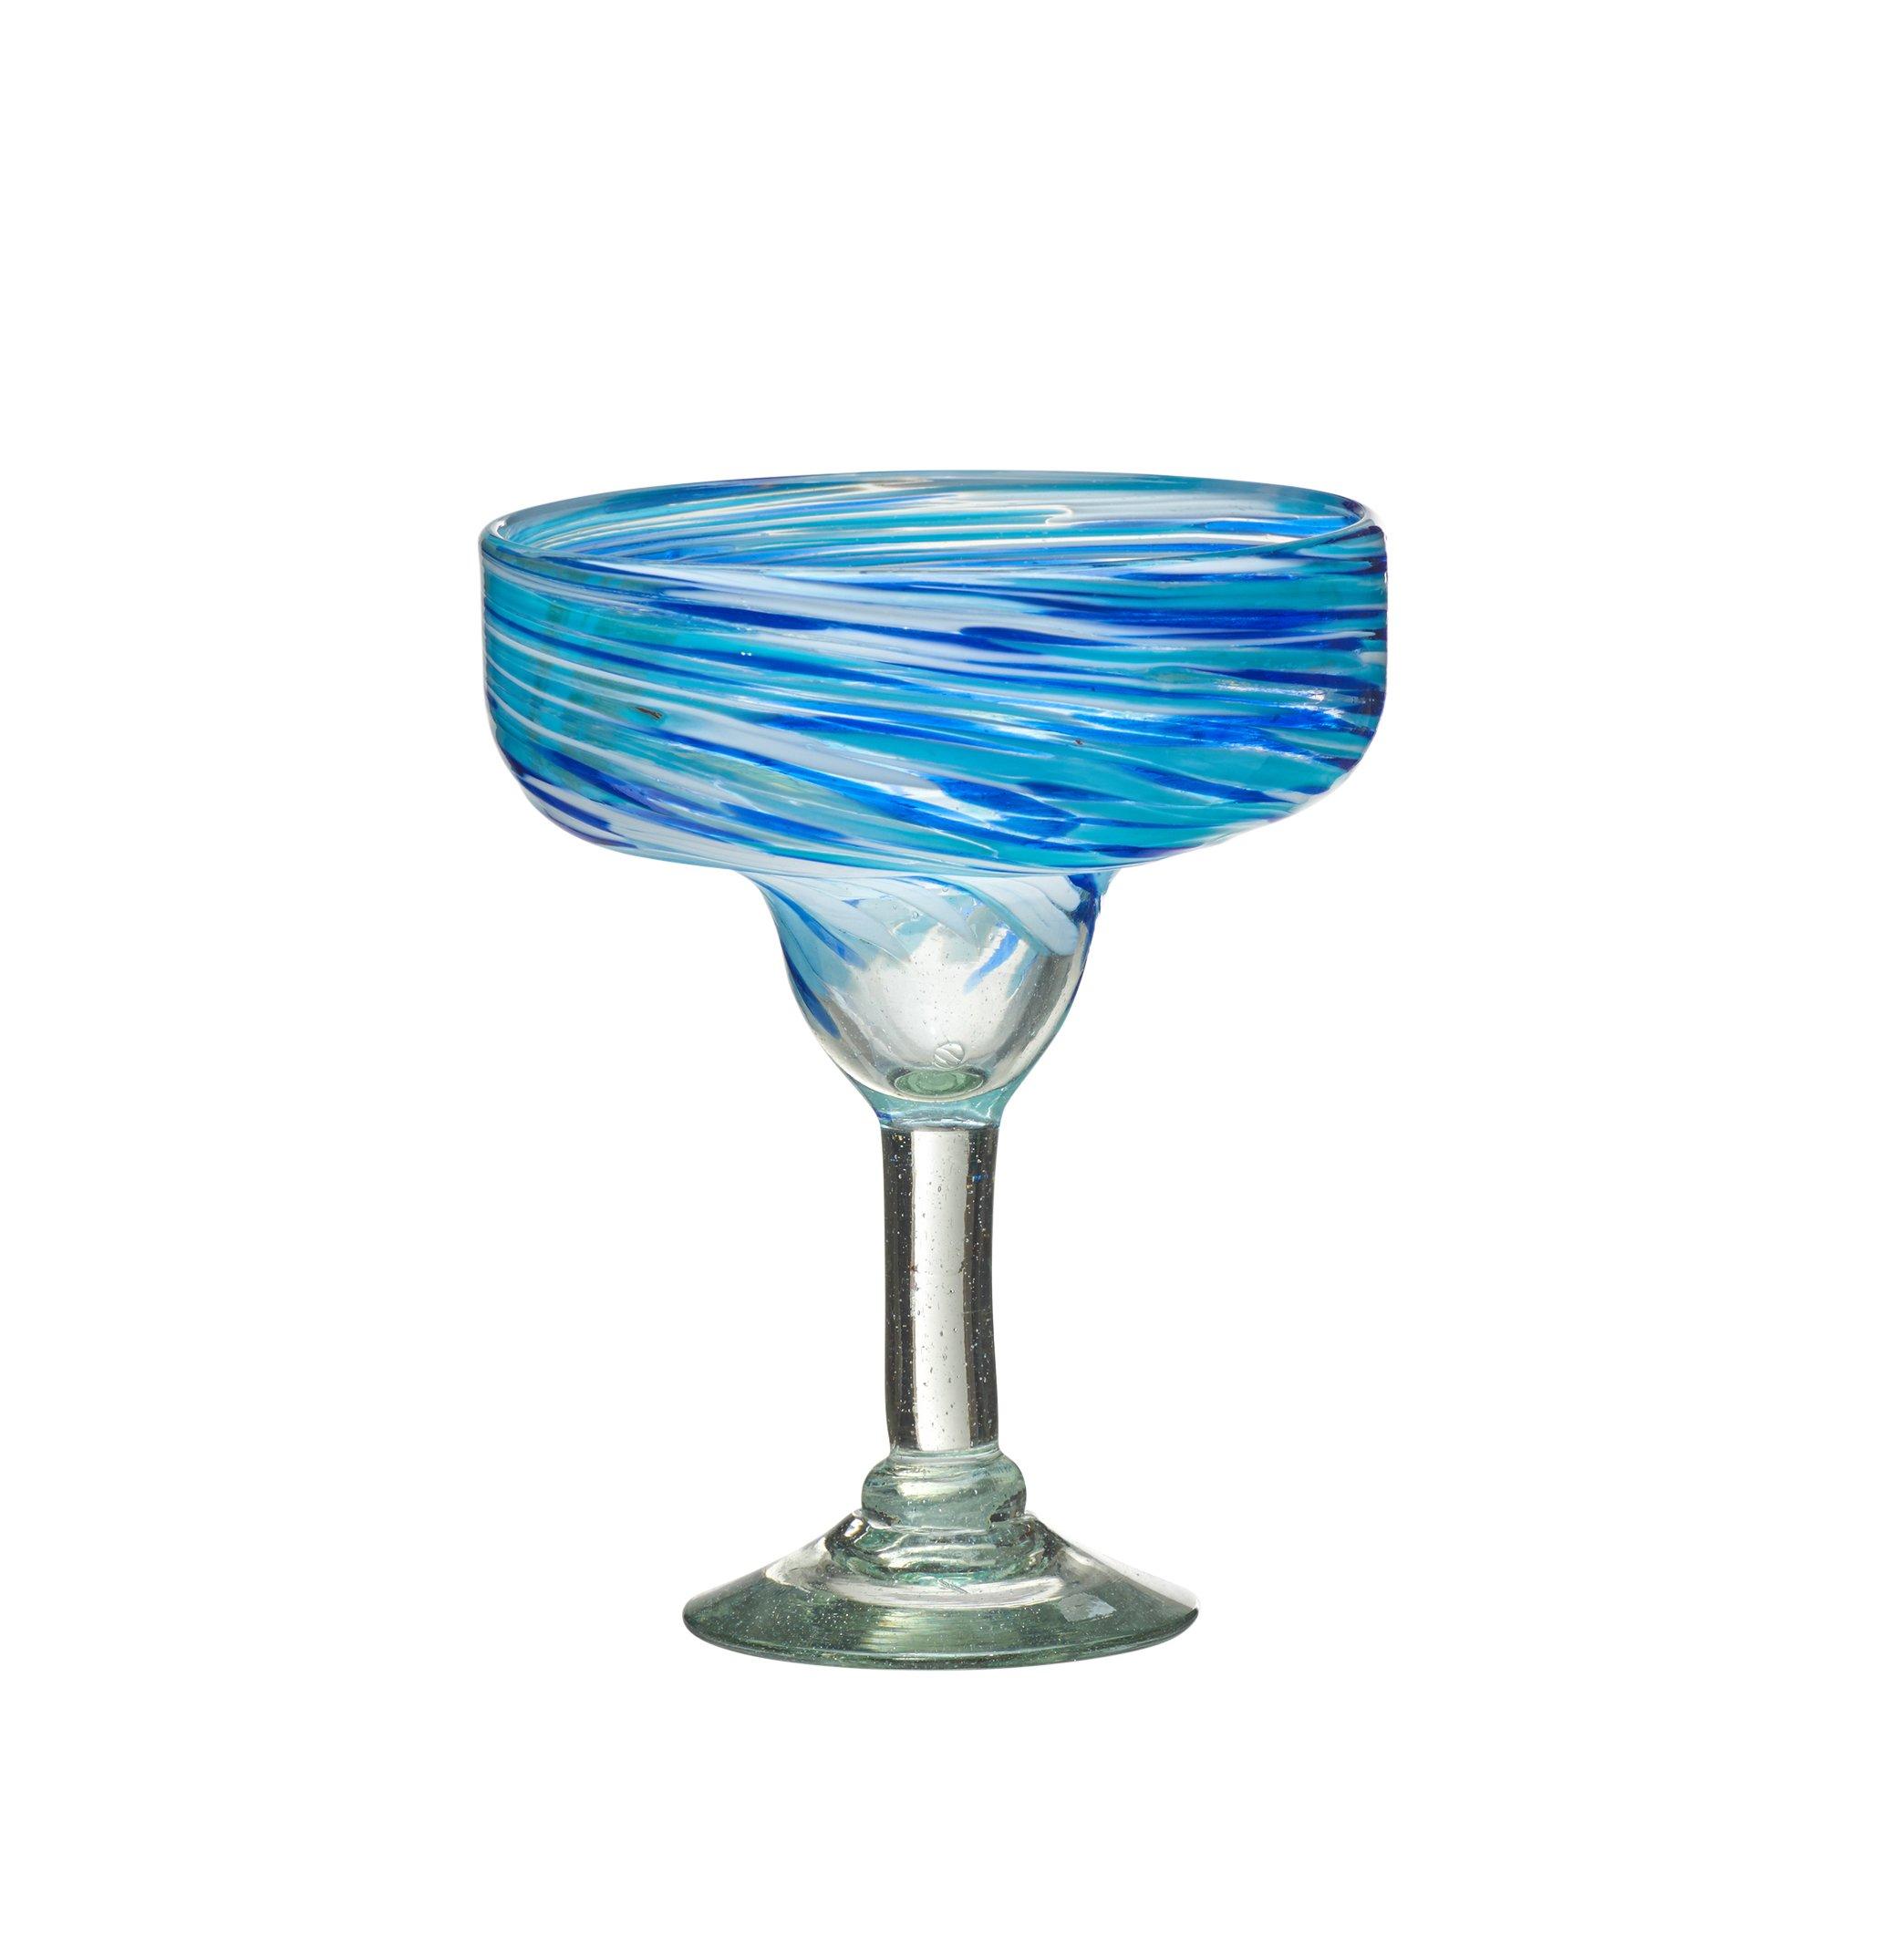 Amici Malibu Collection Margarita Glass - Set of 4 by Amici Home